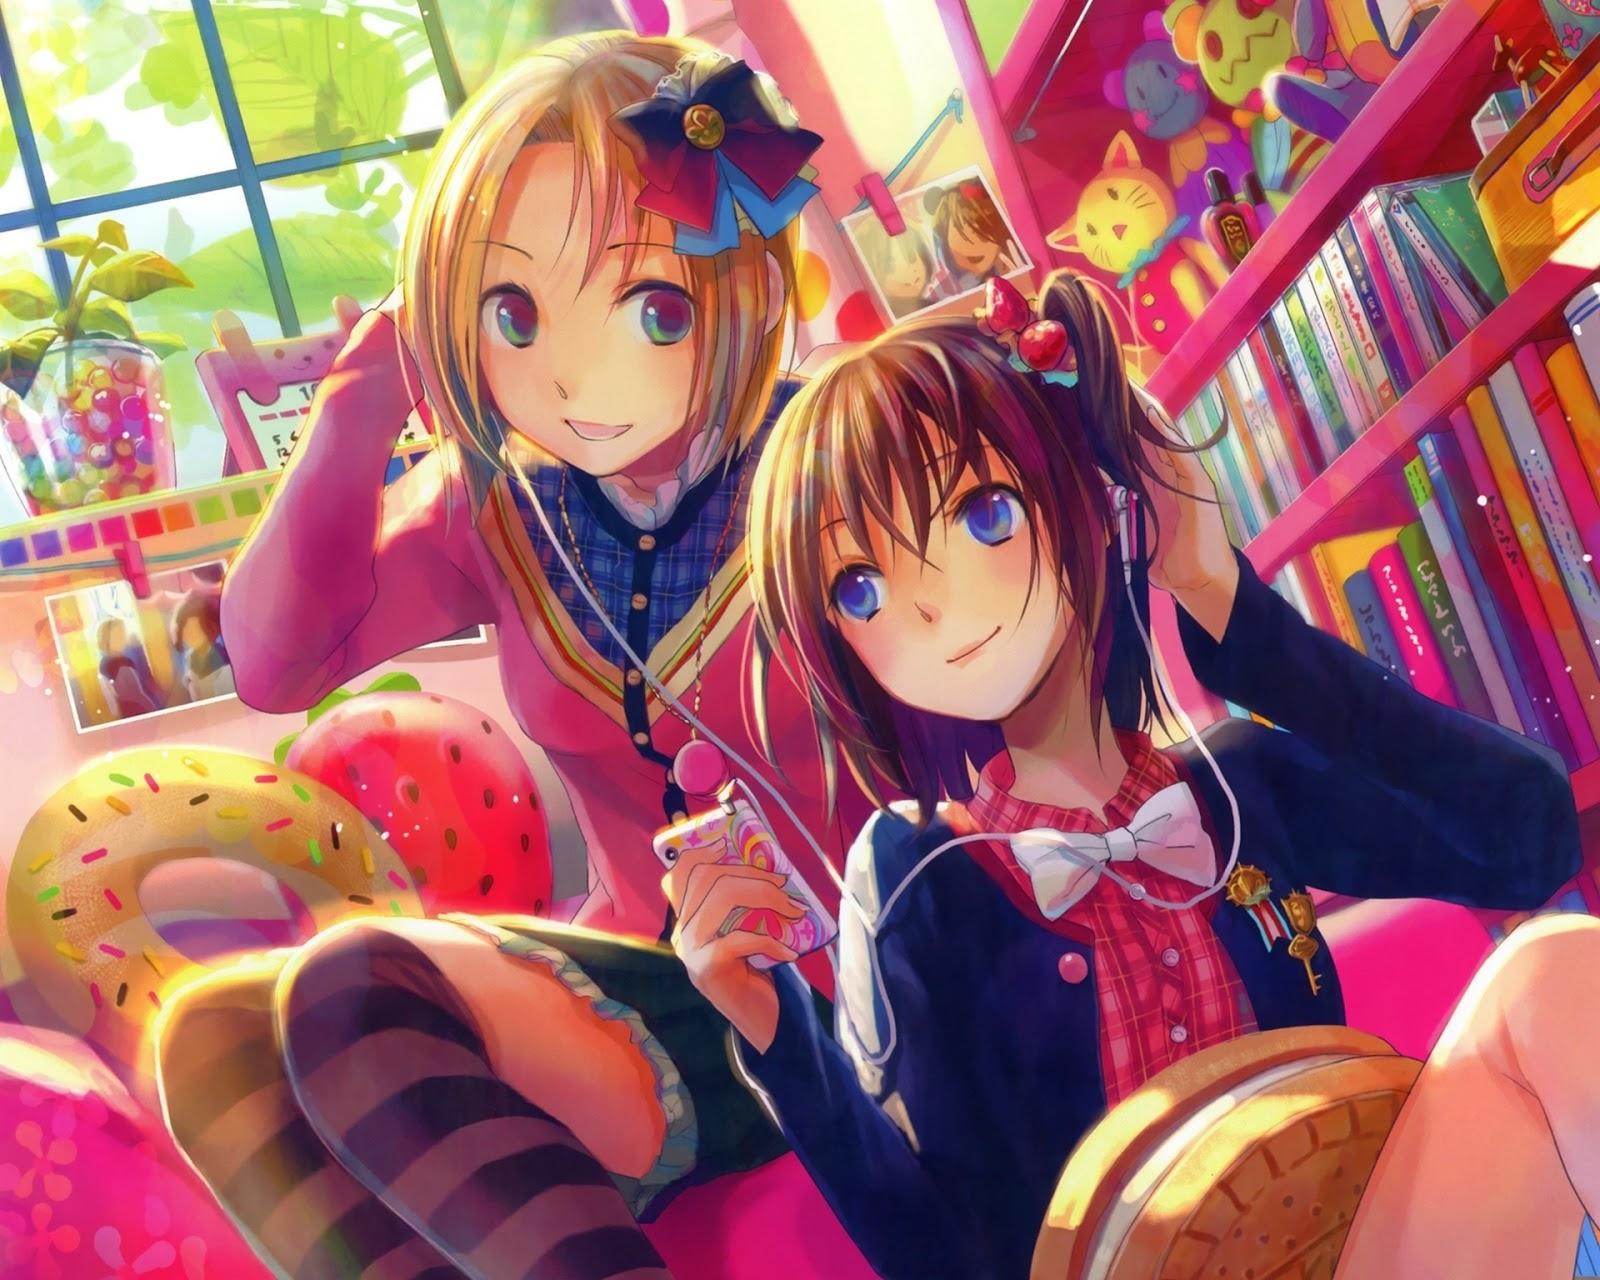 anime best friends wallpaper - photo #2